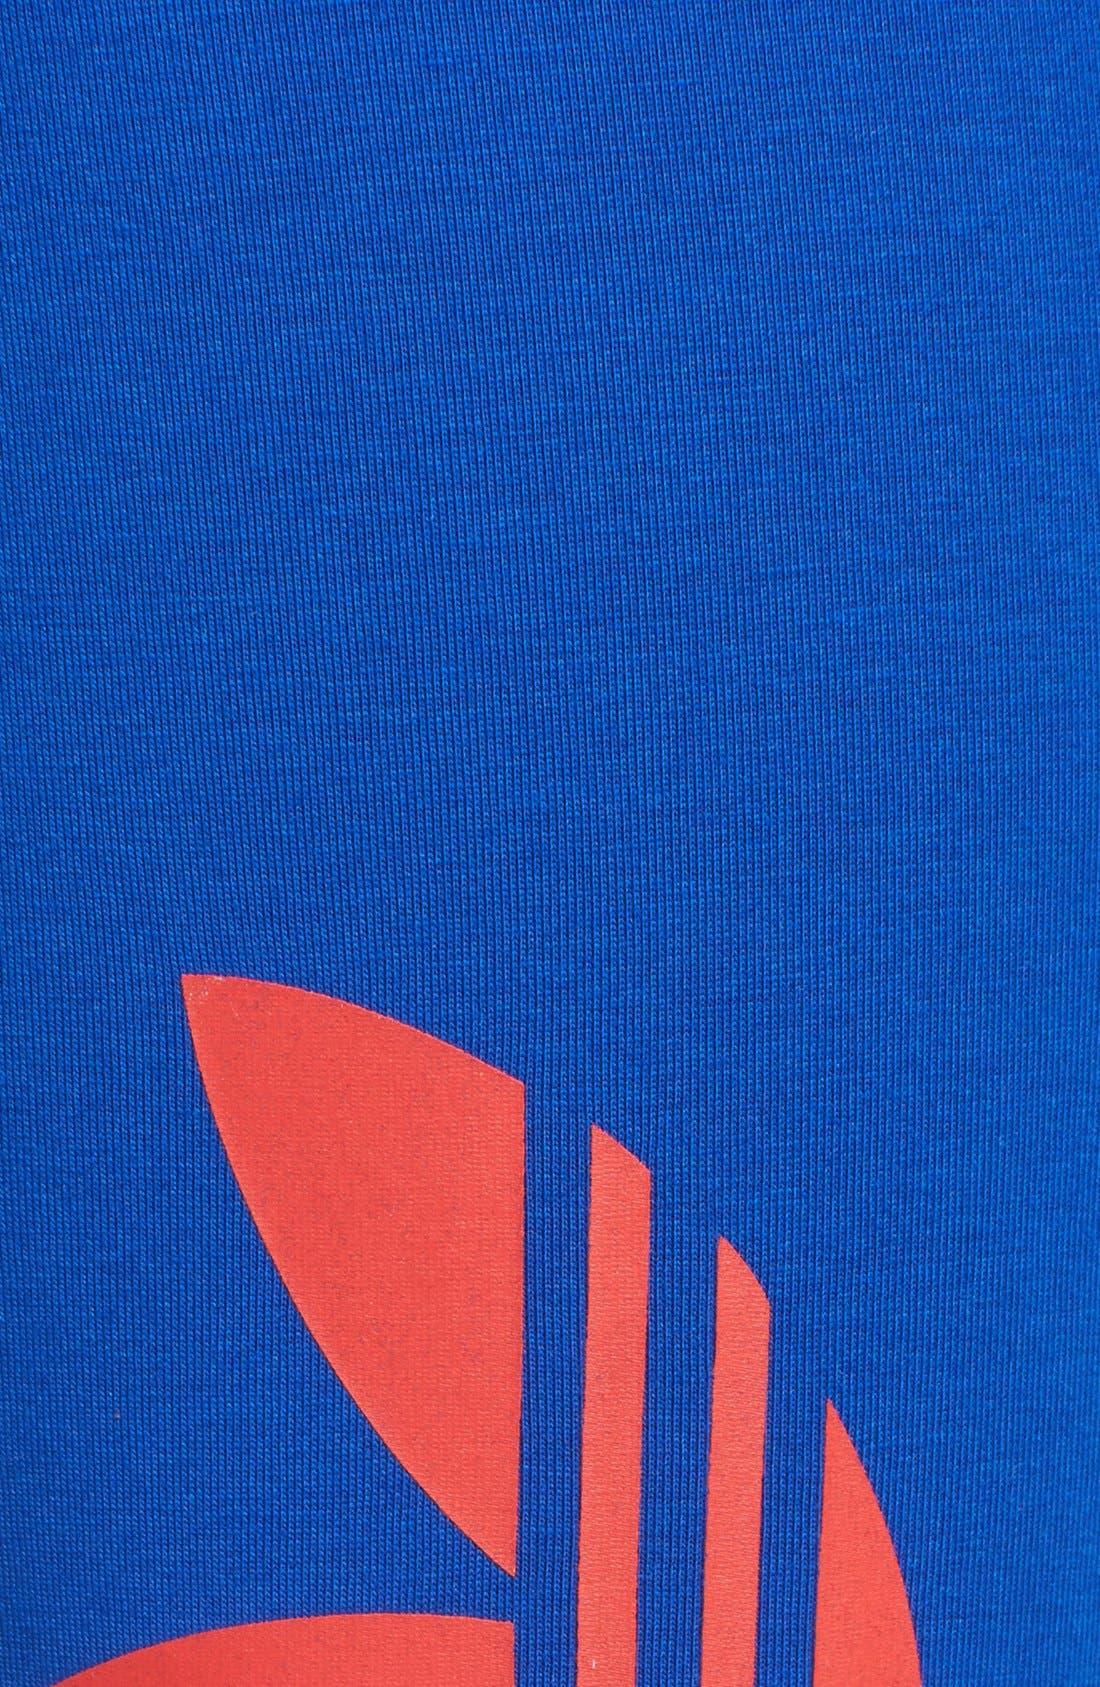 Alternate Image 4  - adidas Originals 'Country' Tights